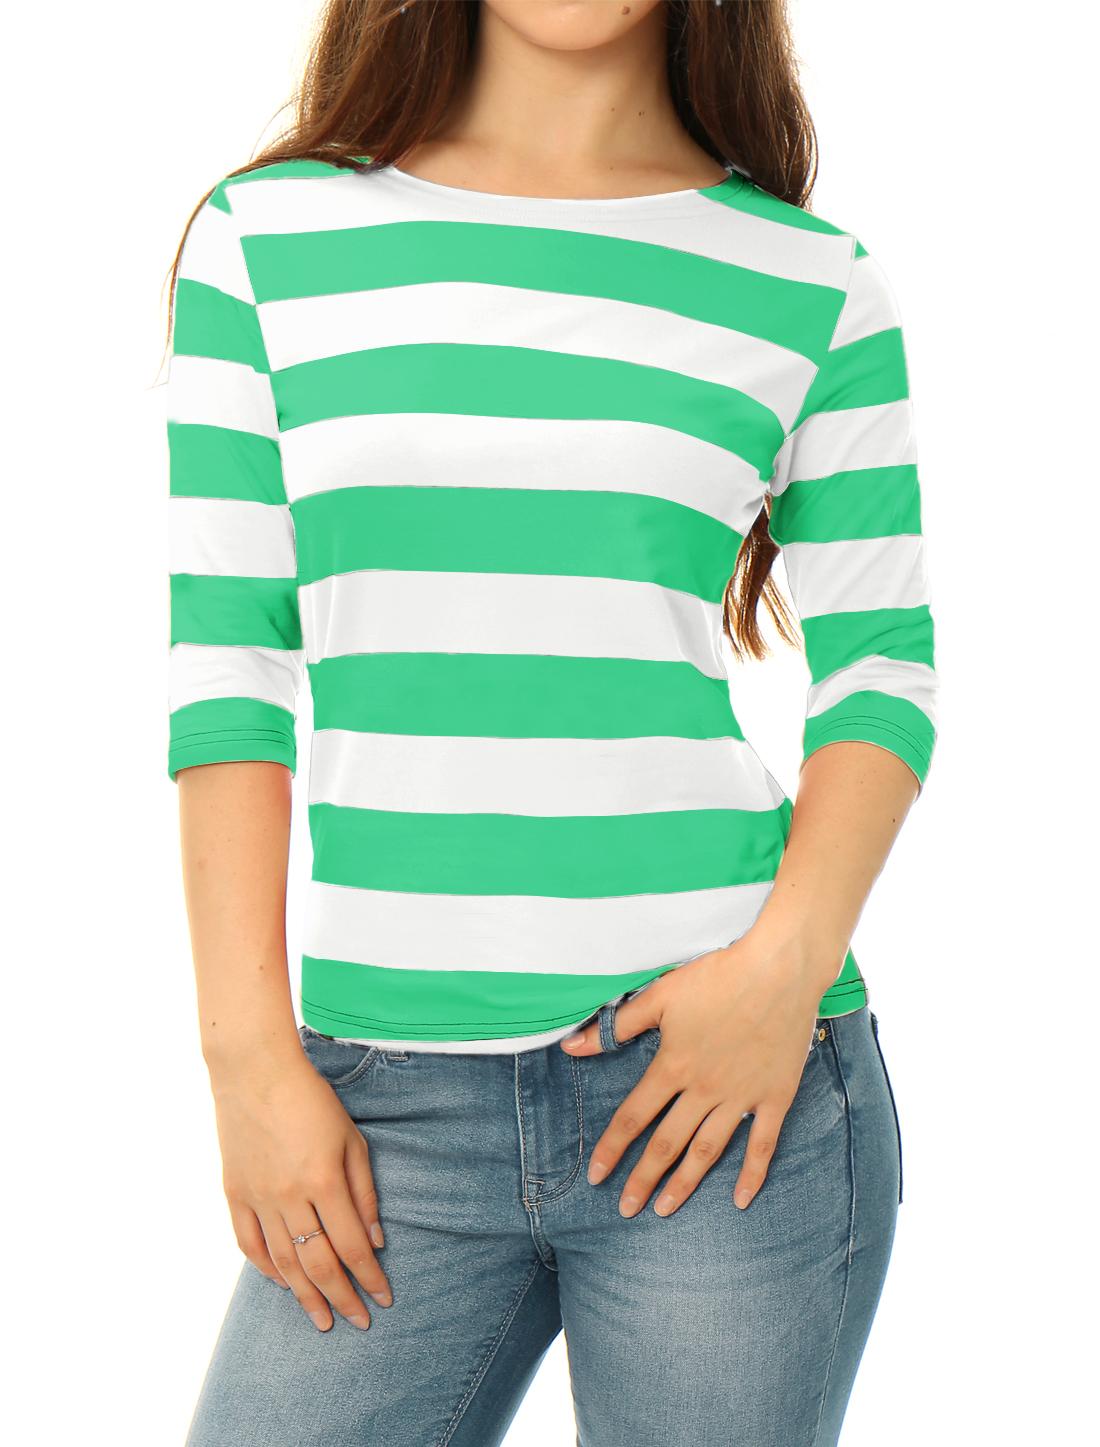 Women Elbow Sleeves Boat Neck Slim Fit Striped Tee Light Green L